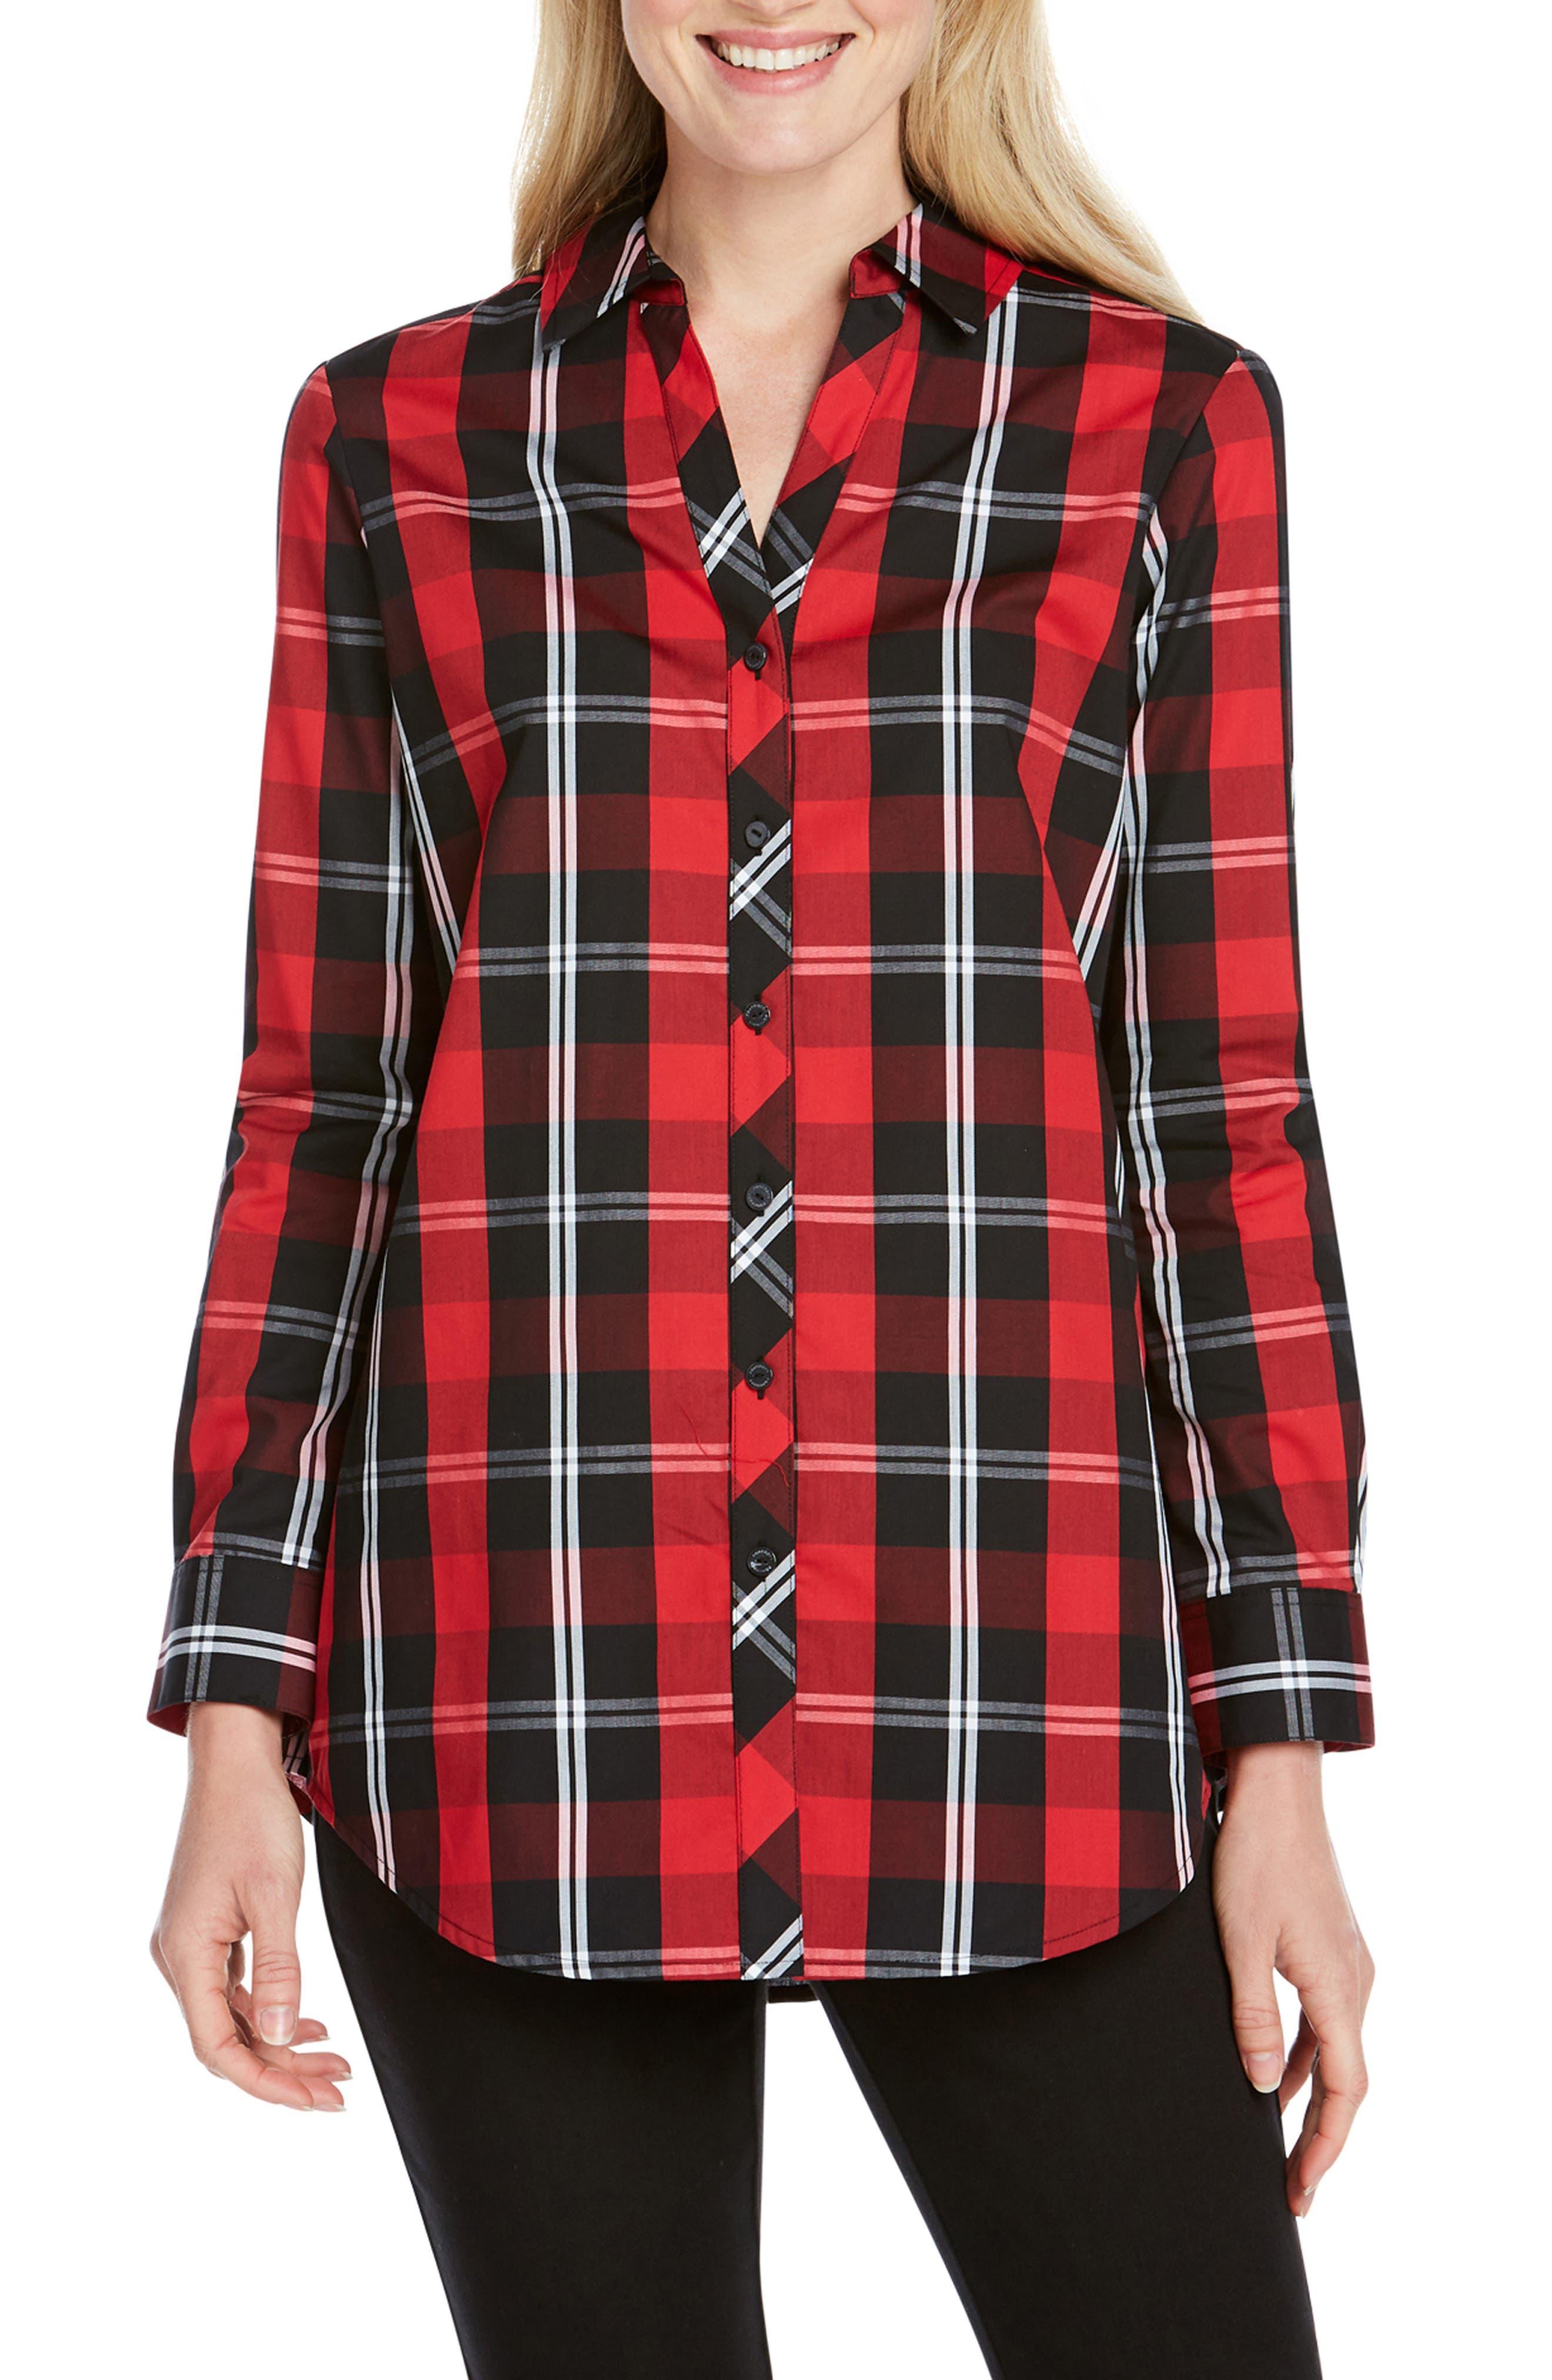 Foxcroft Faith Mackenzie Tartan Shirt, Red